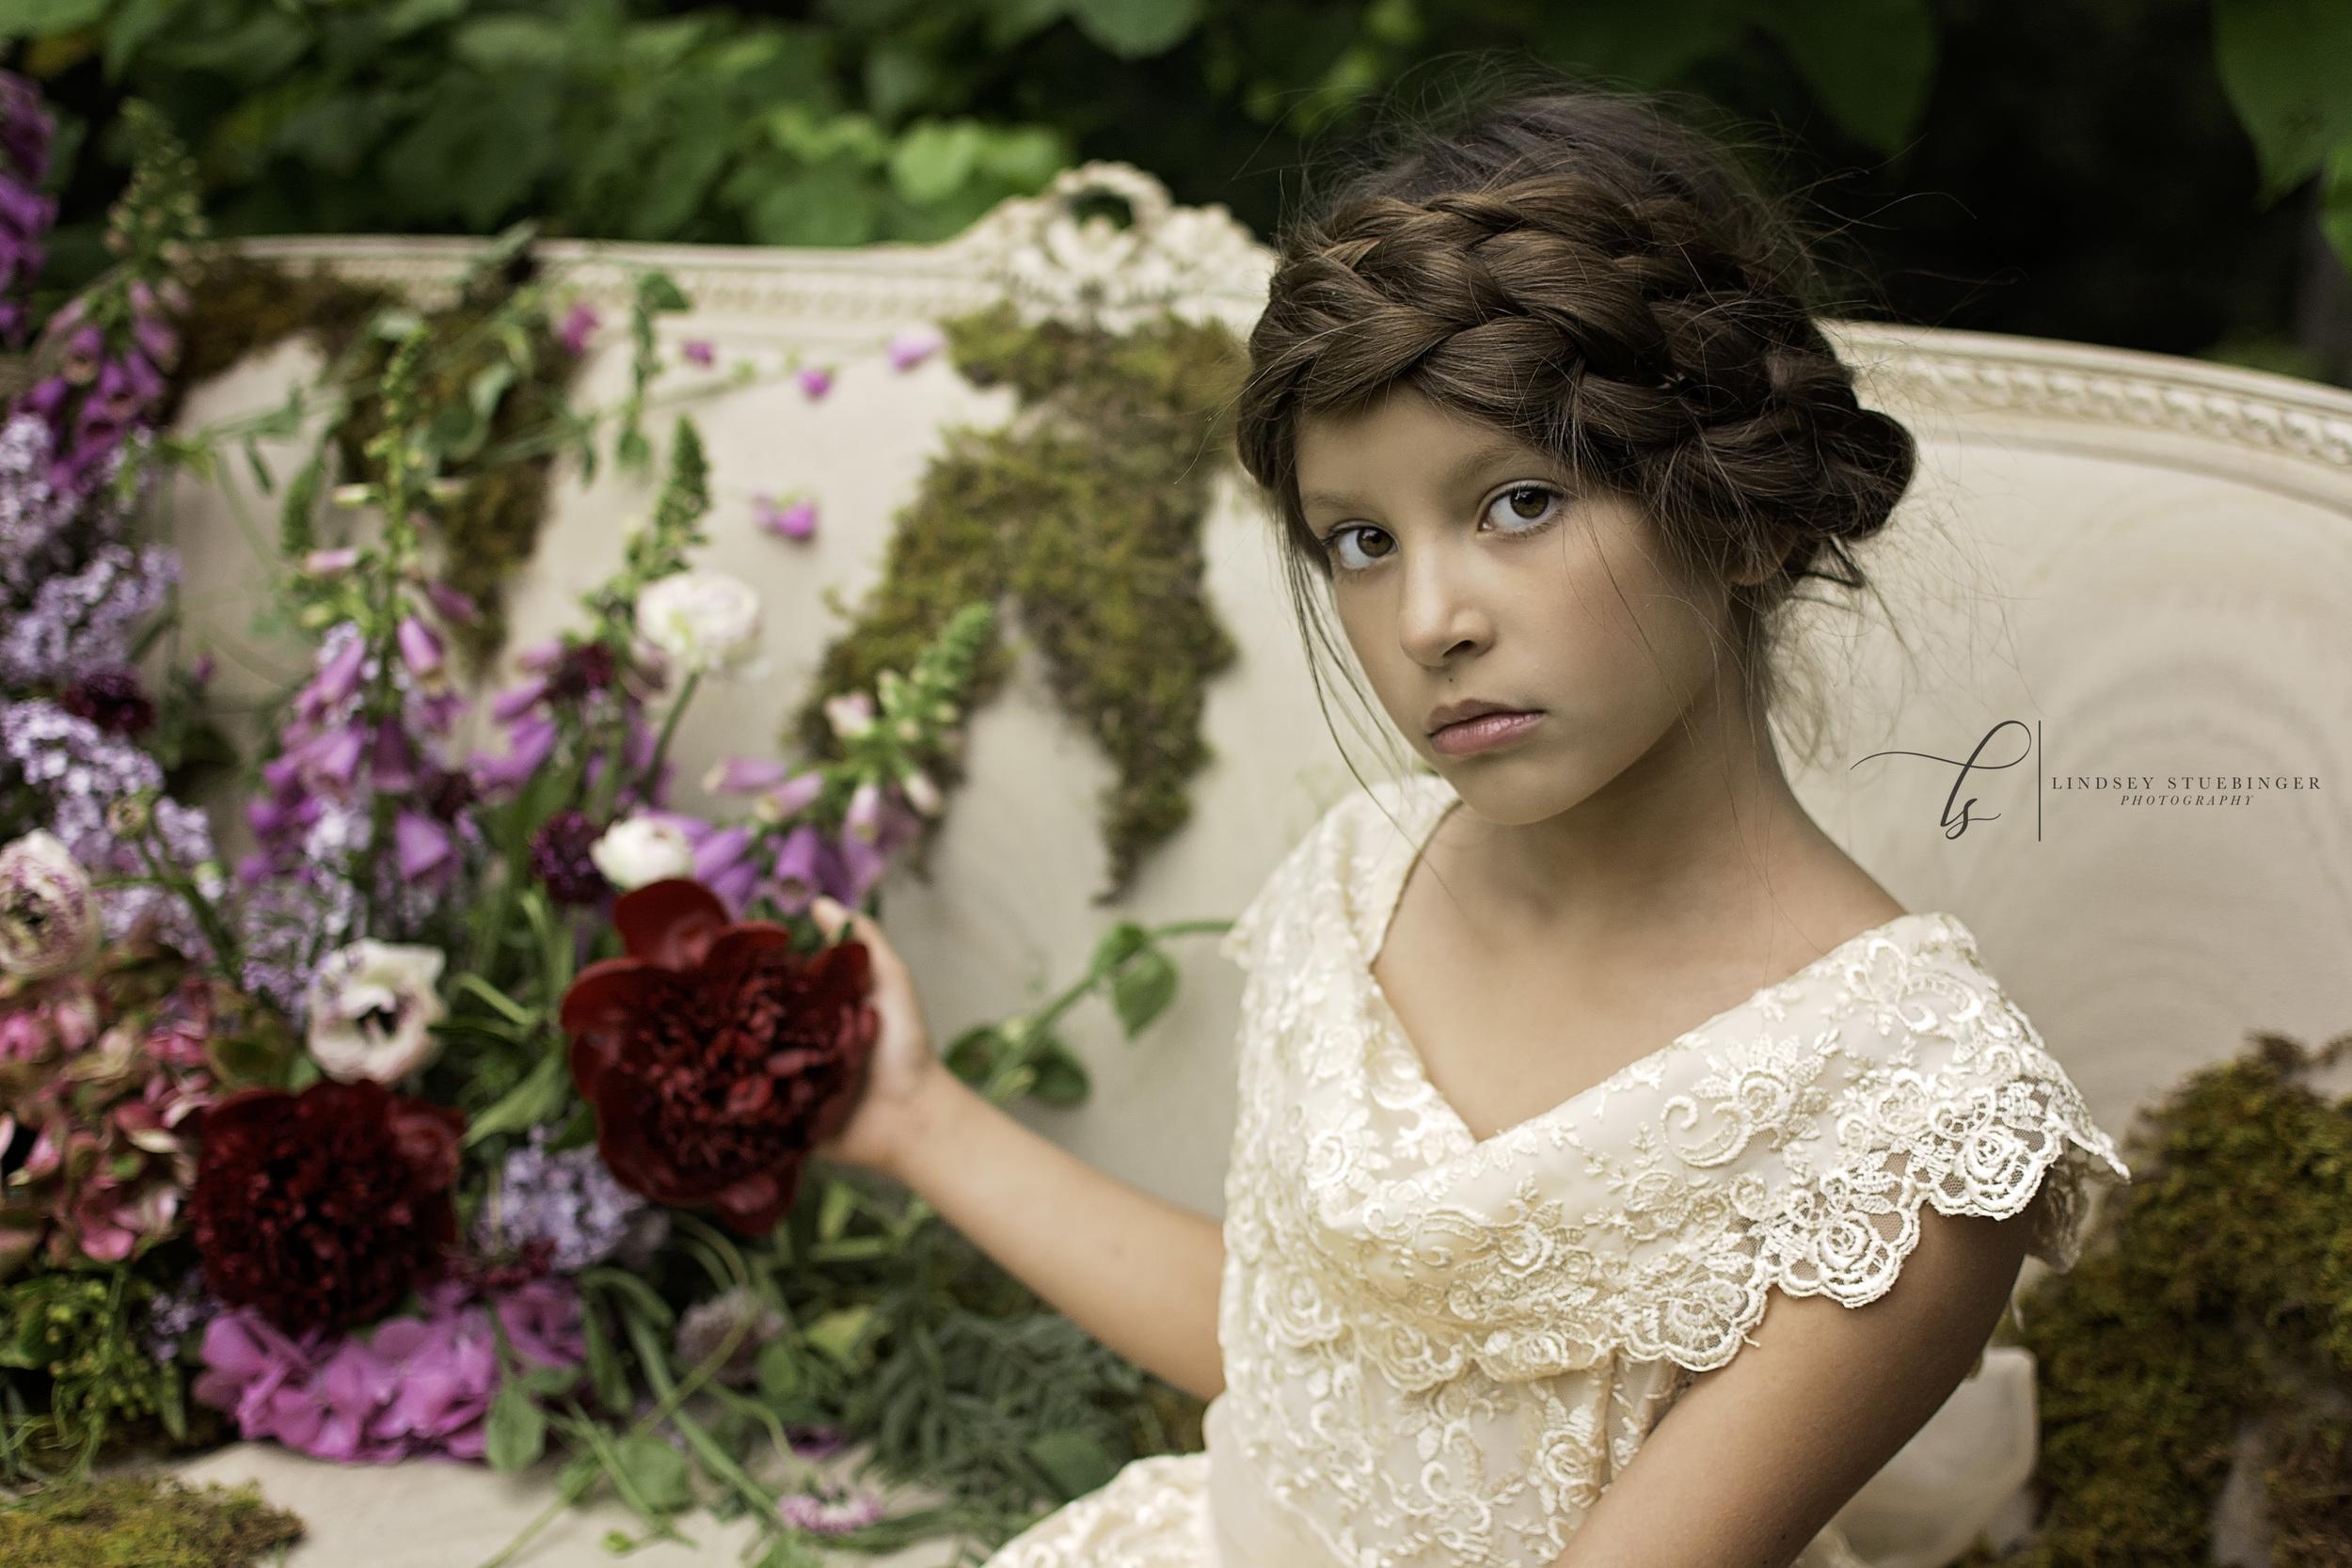 Model: Uriah Buckley